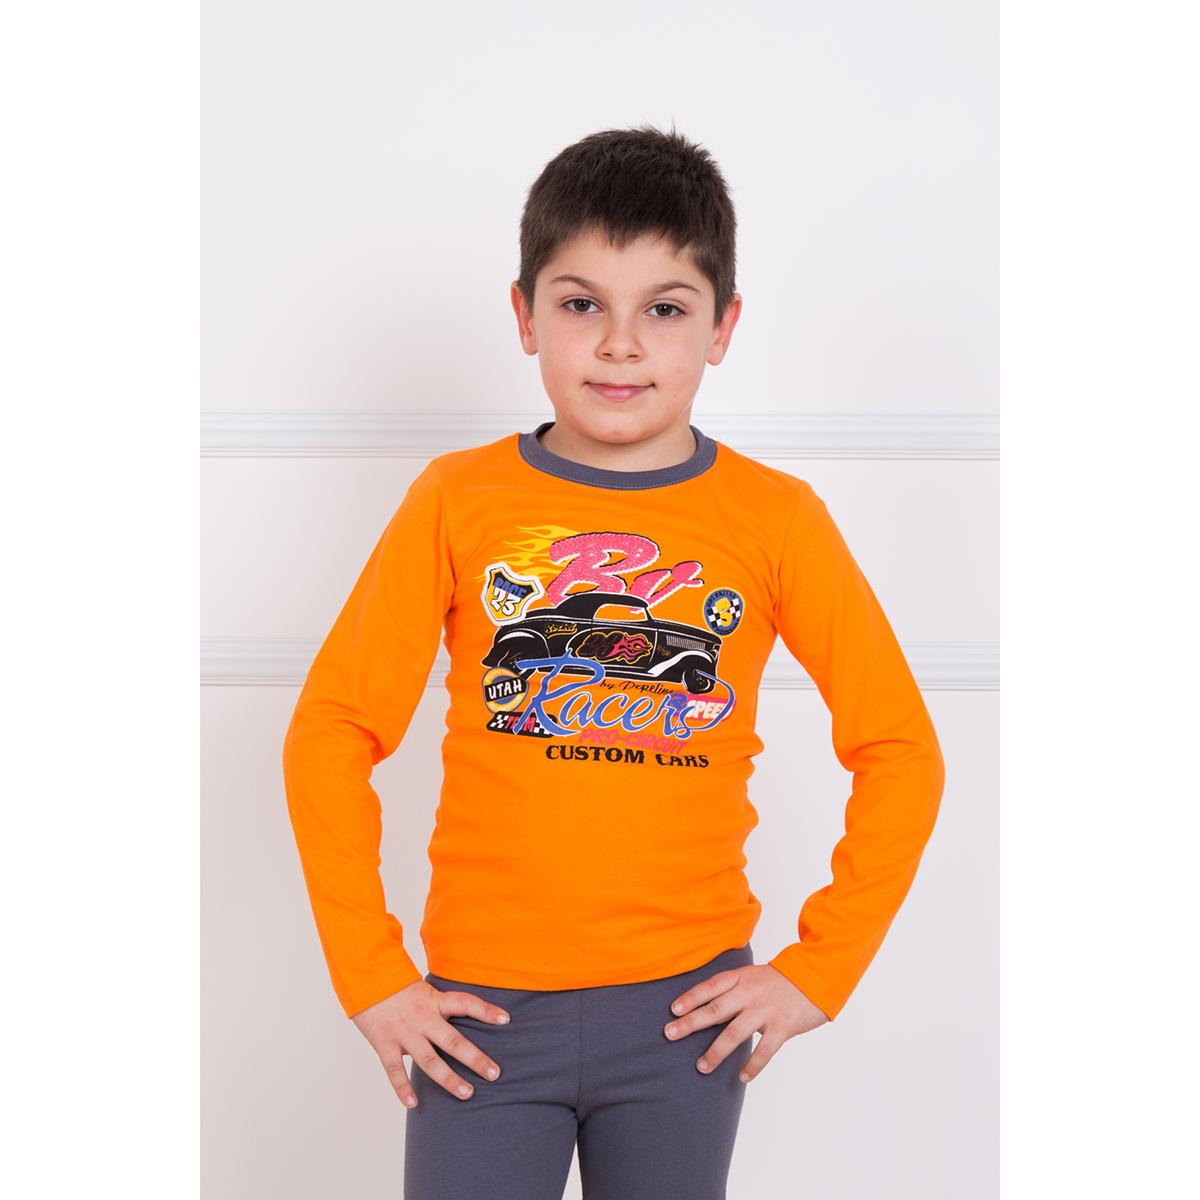 Детский костюм Макар, цвет Синий, размер 5 летКостюмы<br><br><br>Тип: Дет. костюм<br>Размер: 5 лет<br>Материал: Кулирка